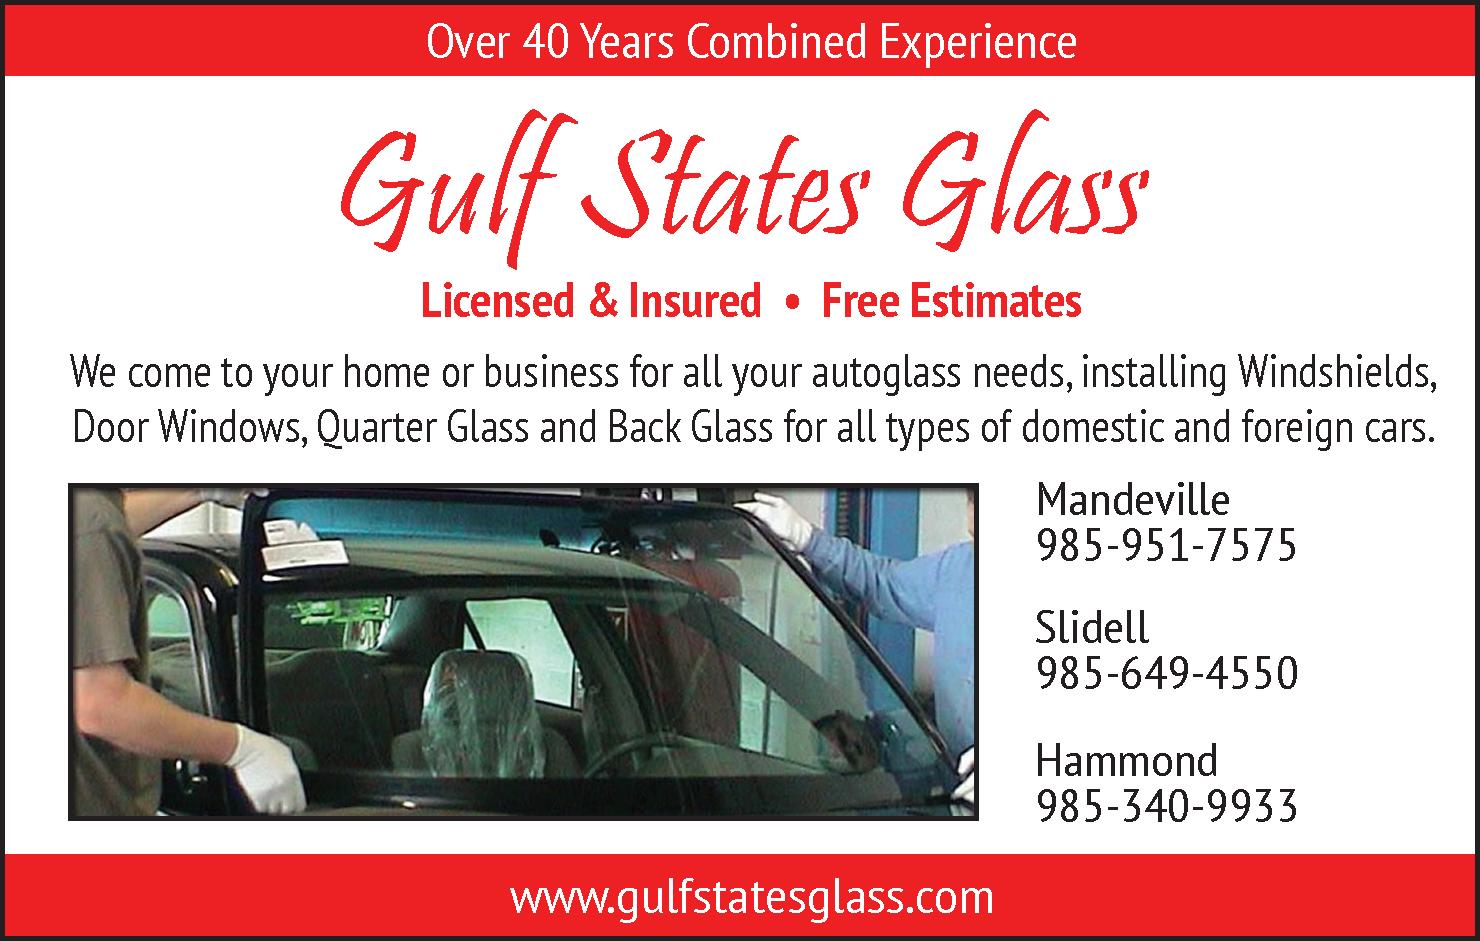 Gulf States Glass